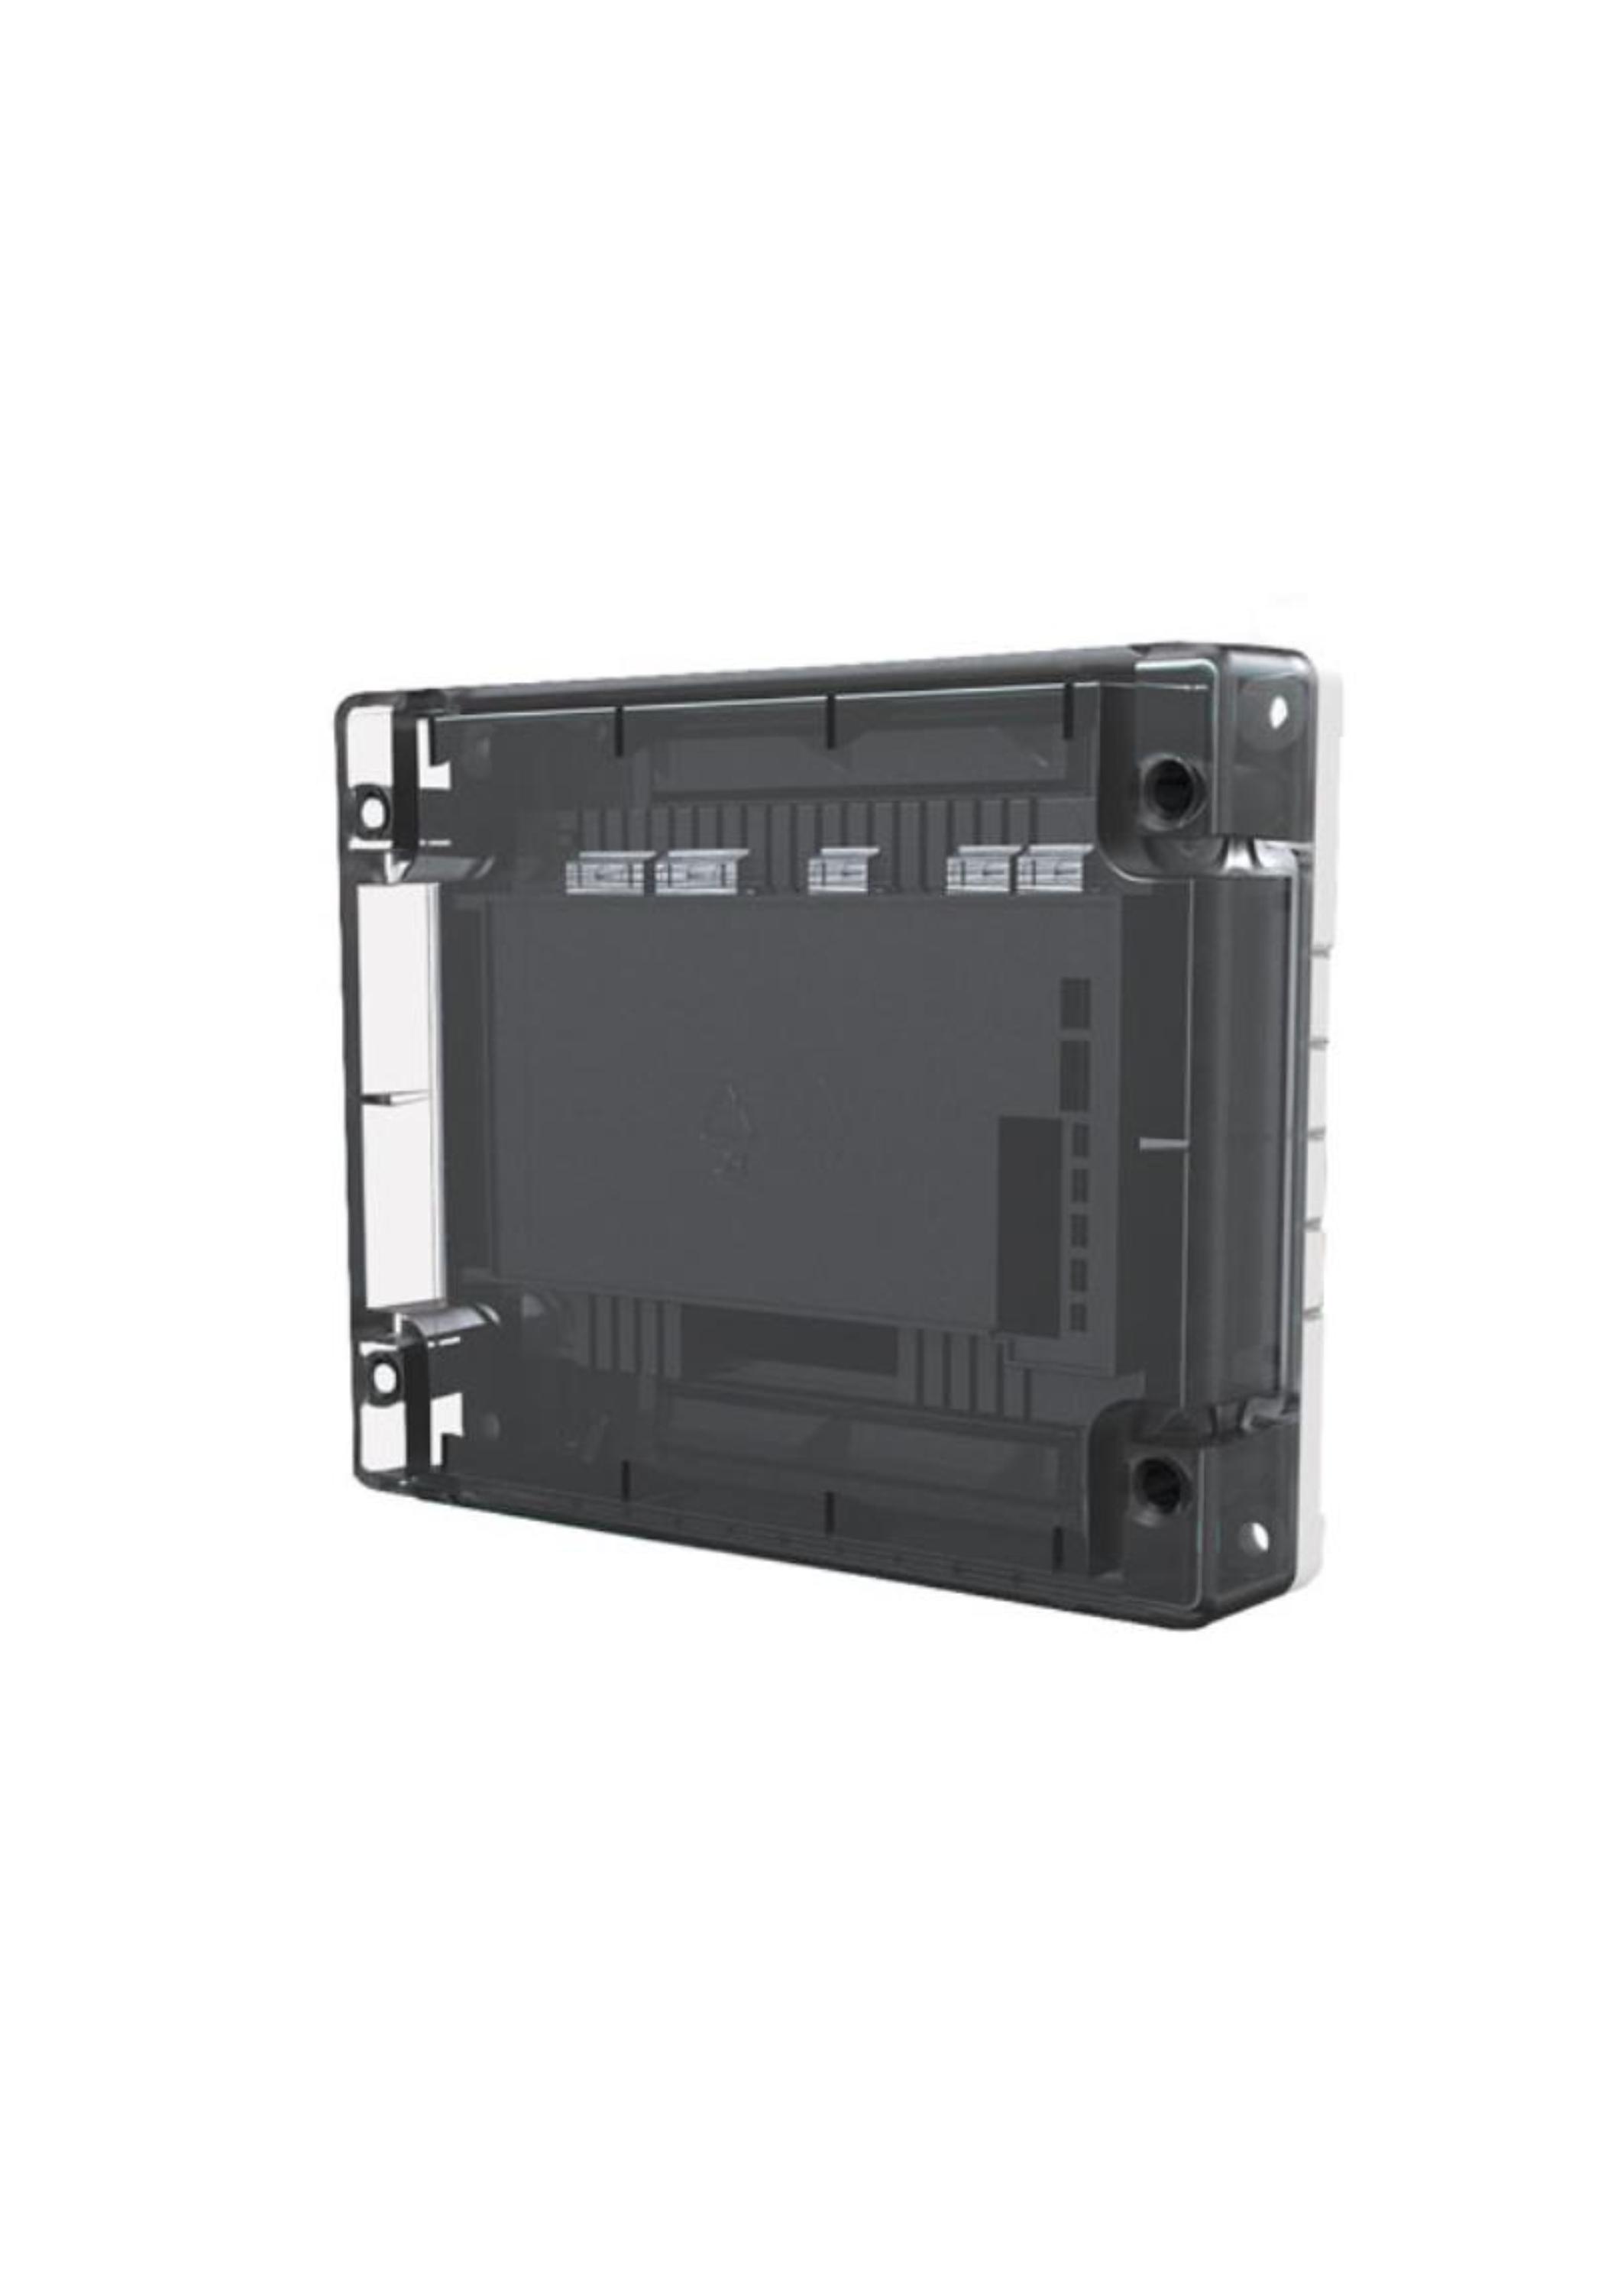 CHQ-MRC2-FS(SCI) Fail Safe Mains Relay Module with...